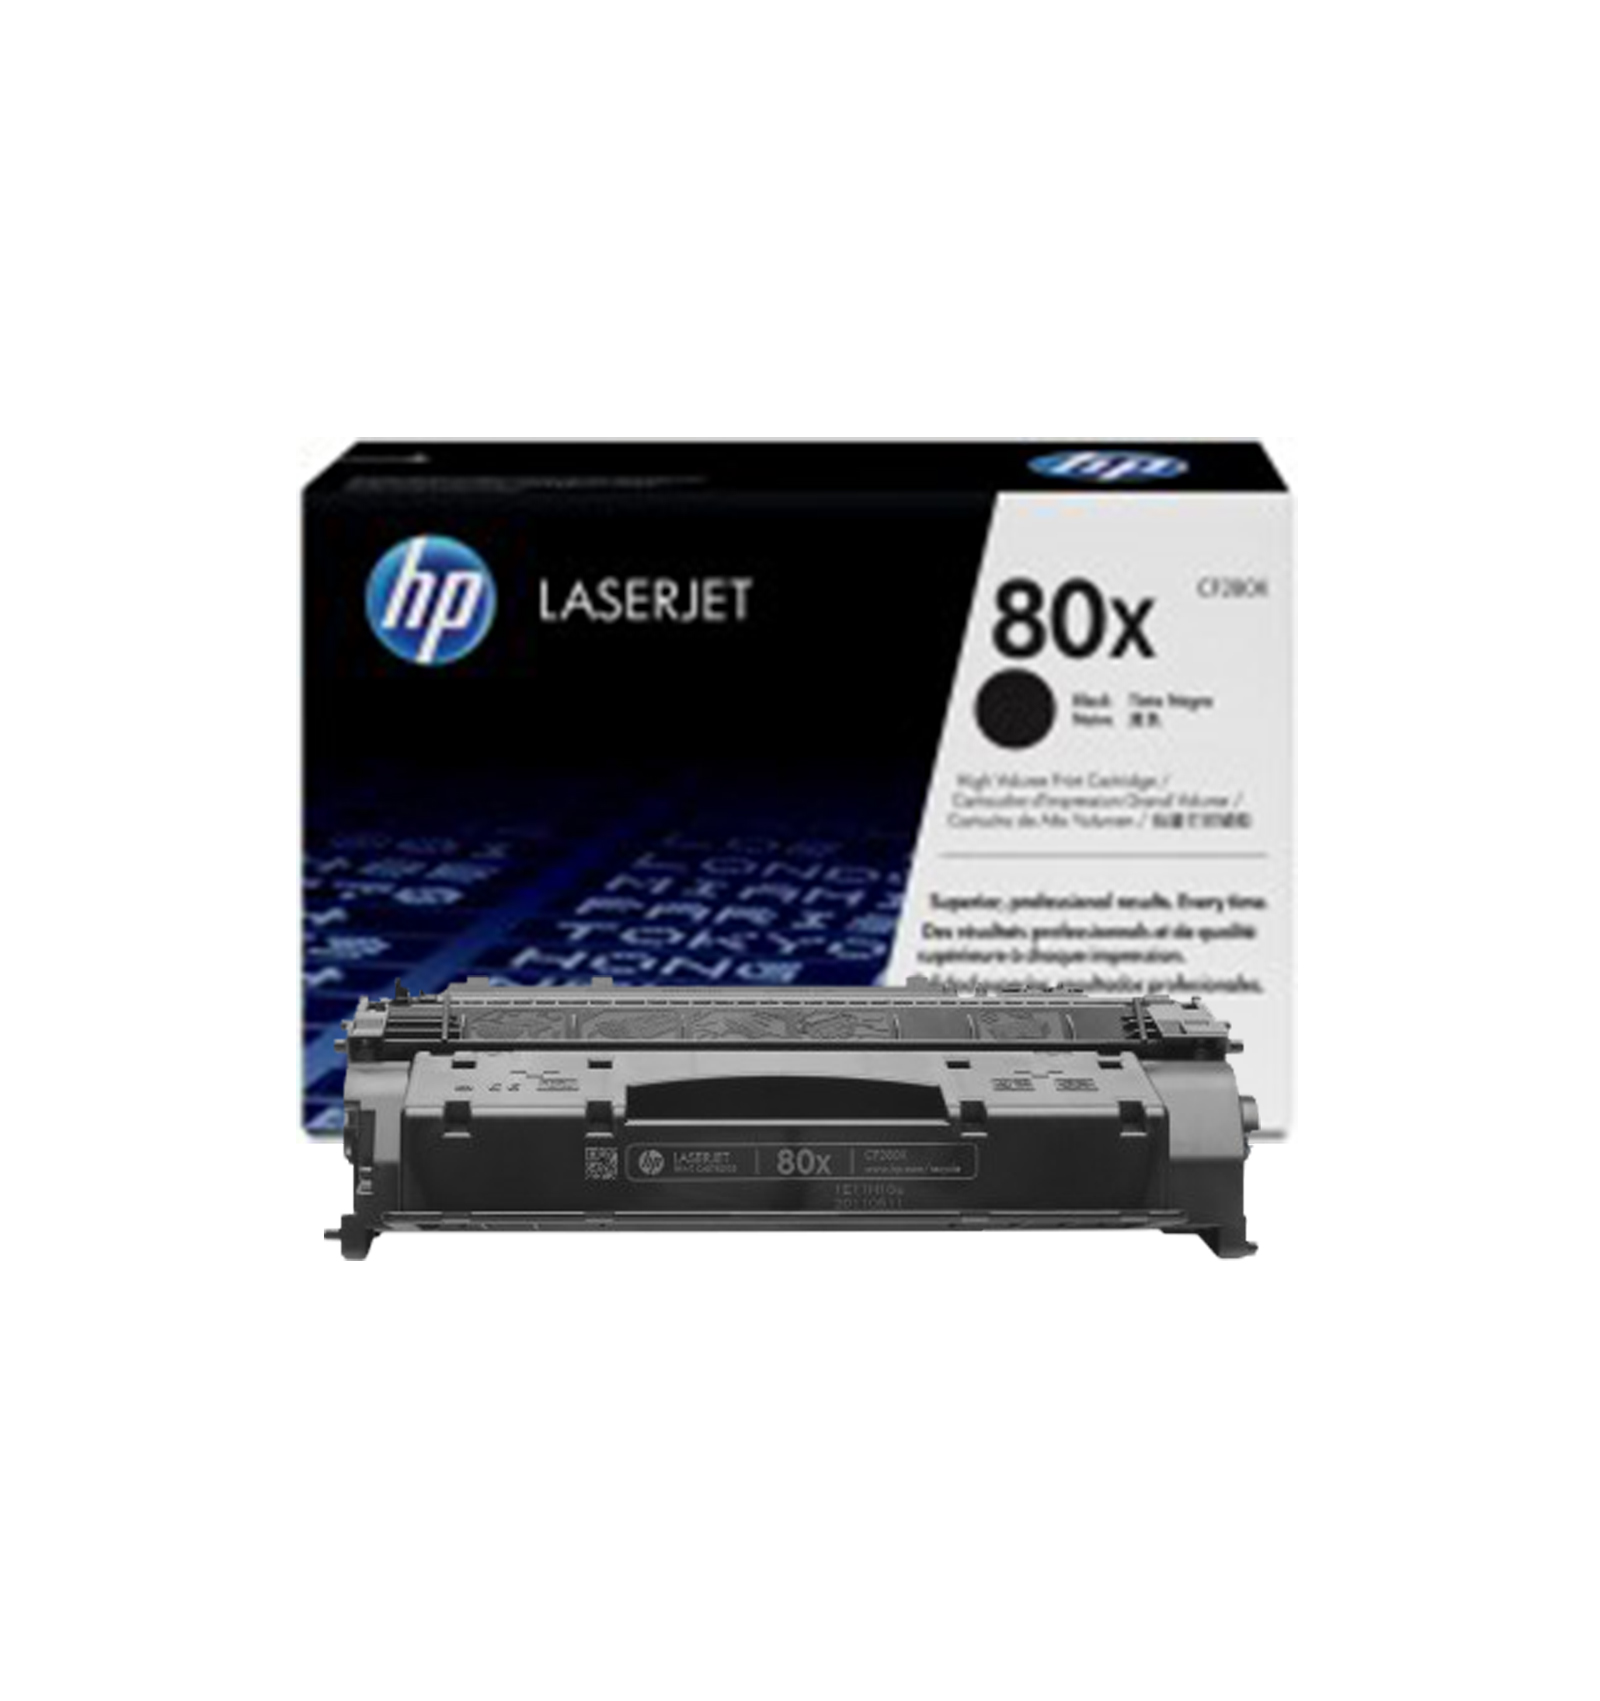 Заправка картриджей HP CF280X (80X) для LaserJet Pro 400 M401a/M401d/M401dn/M401dw/M425